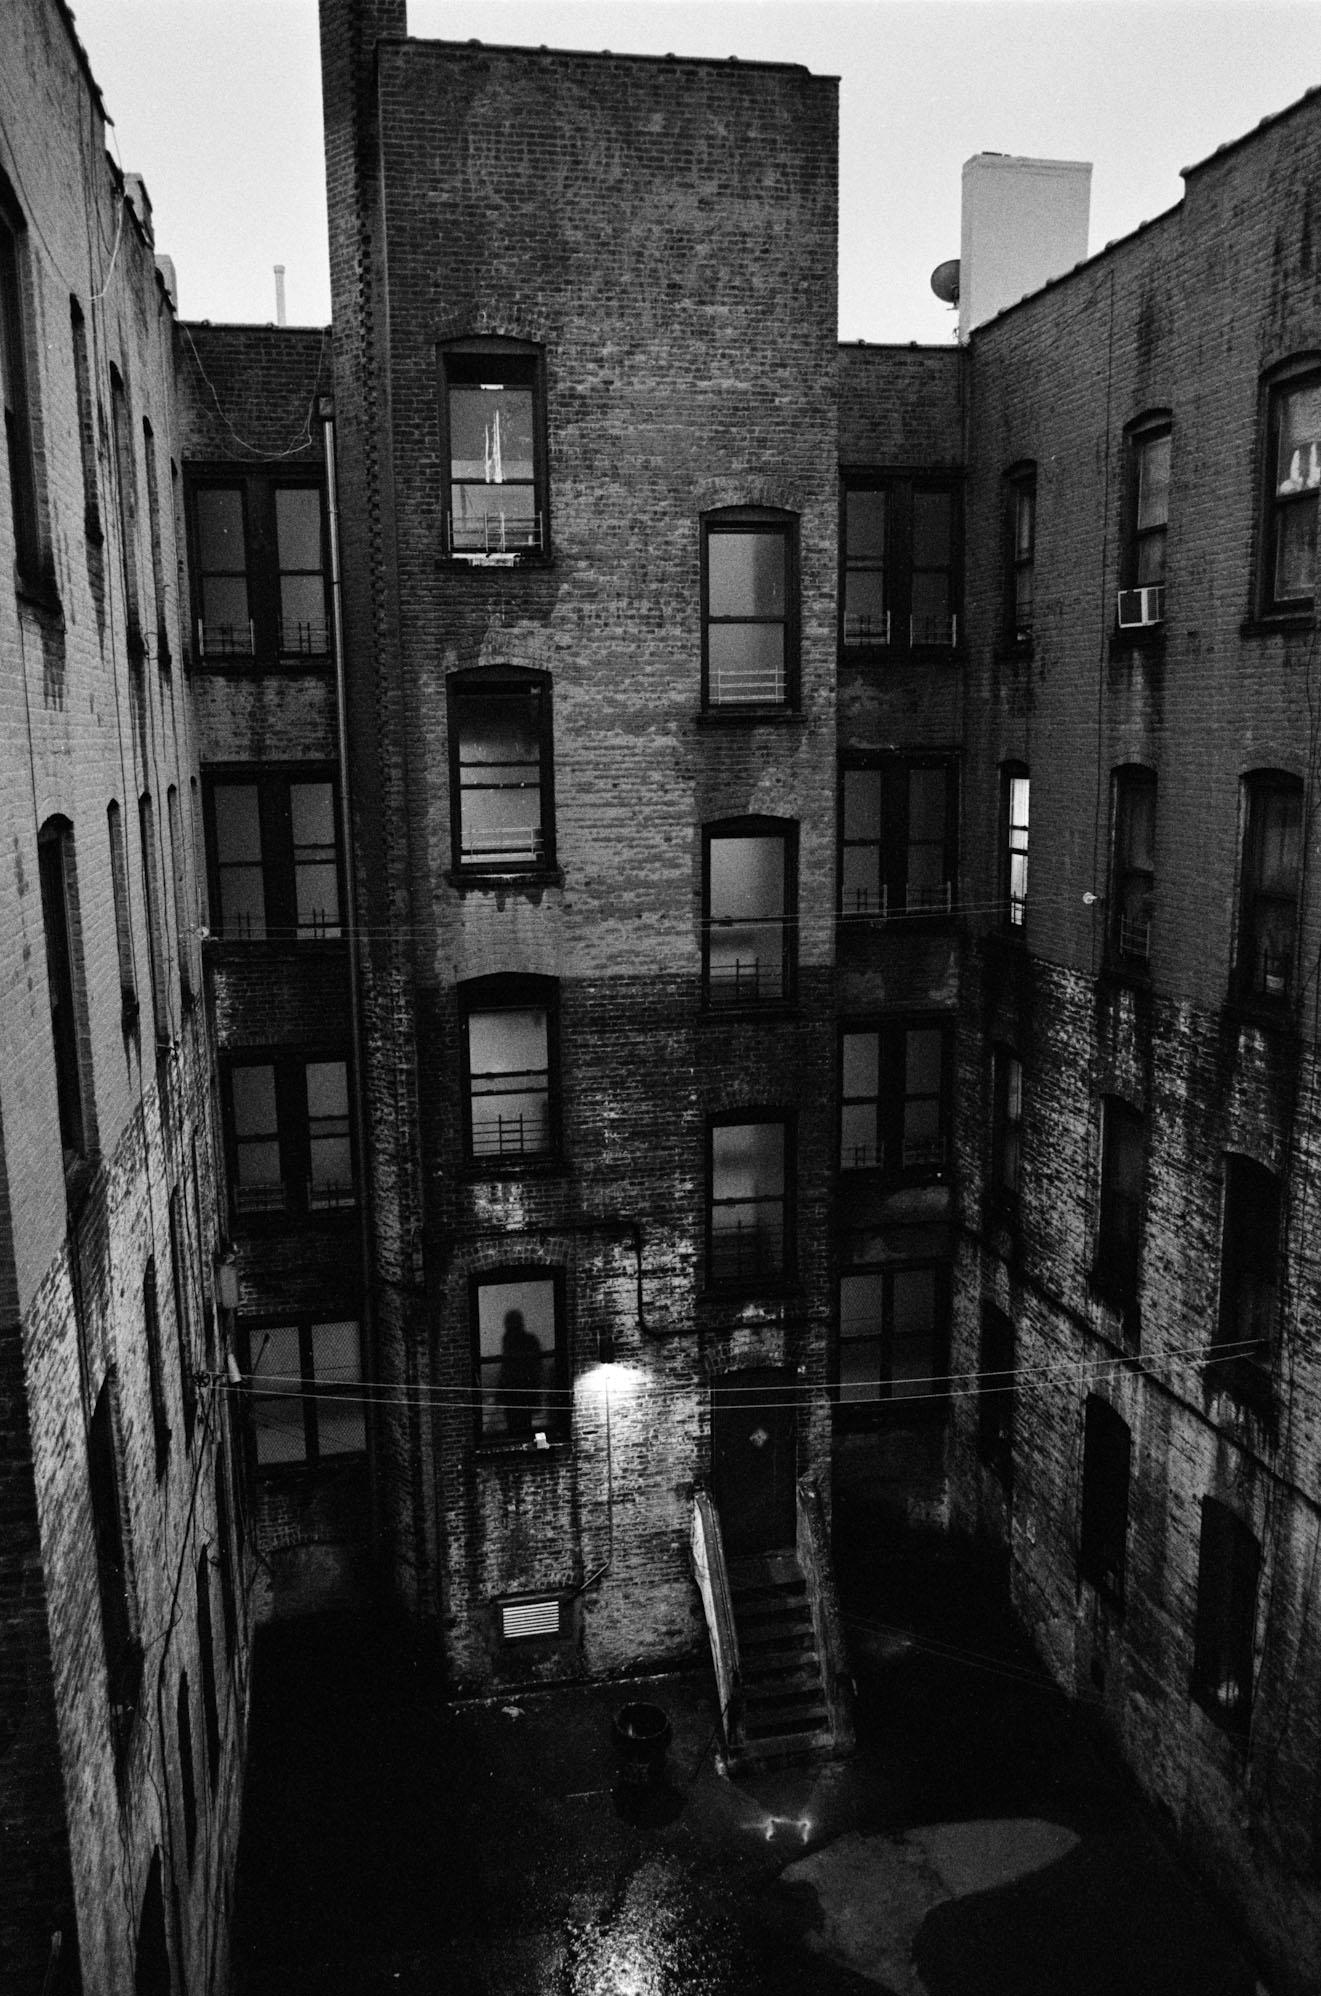 New-york-noir-cooper-ray-3